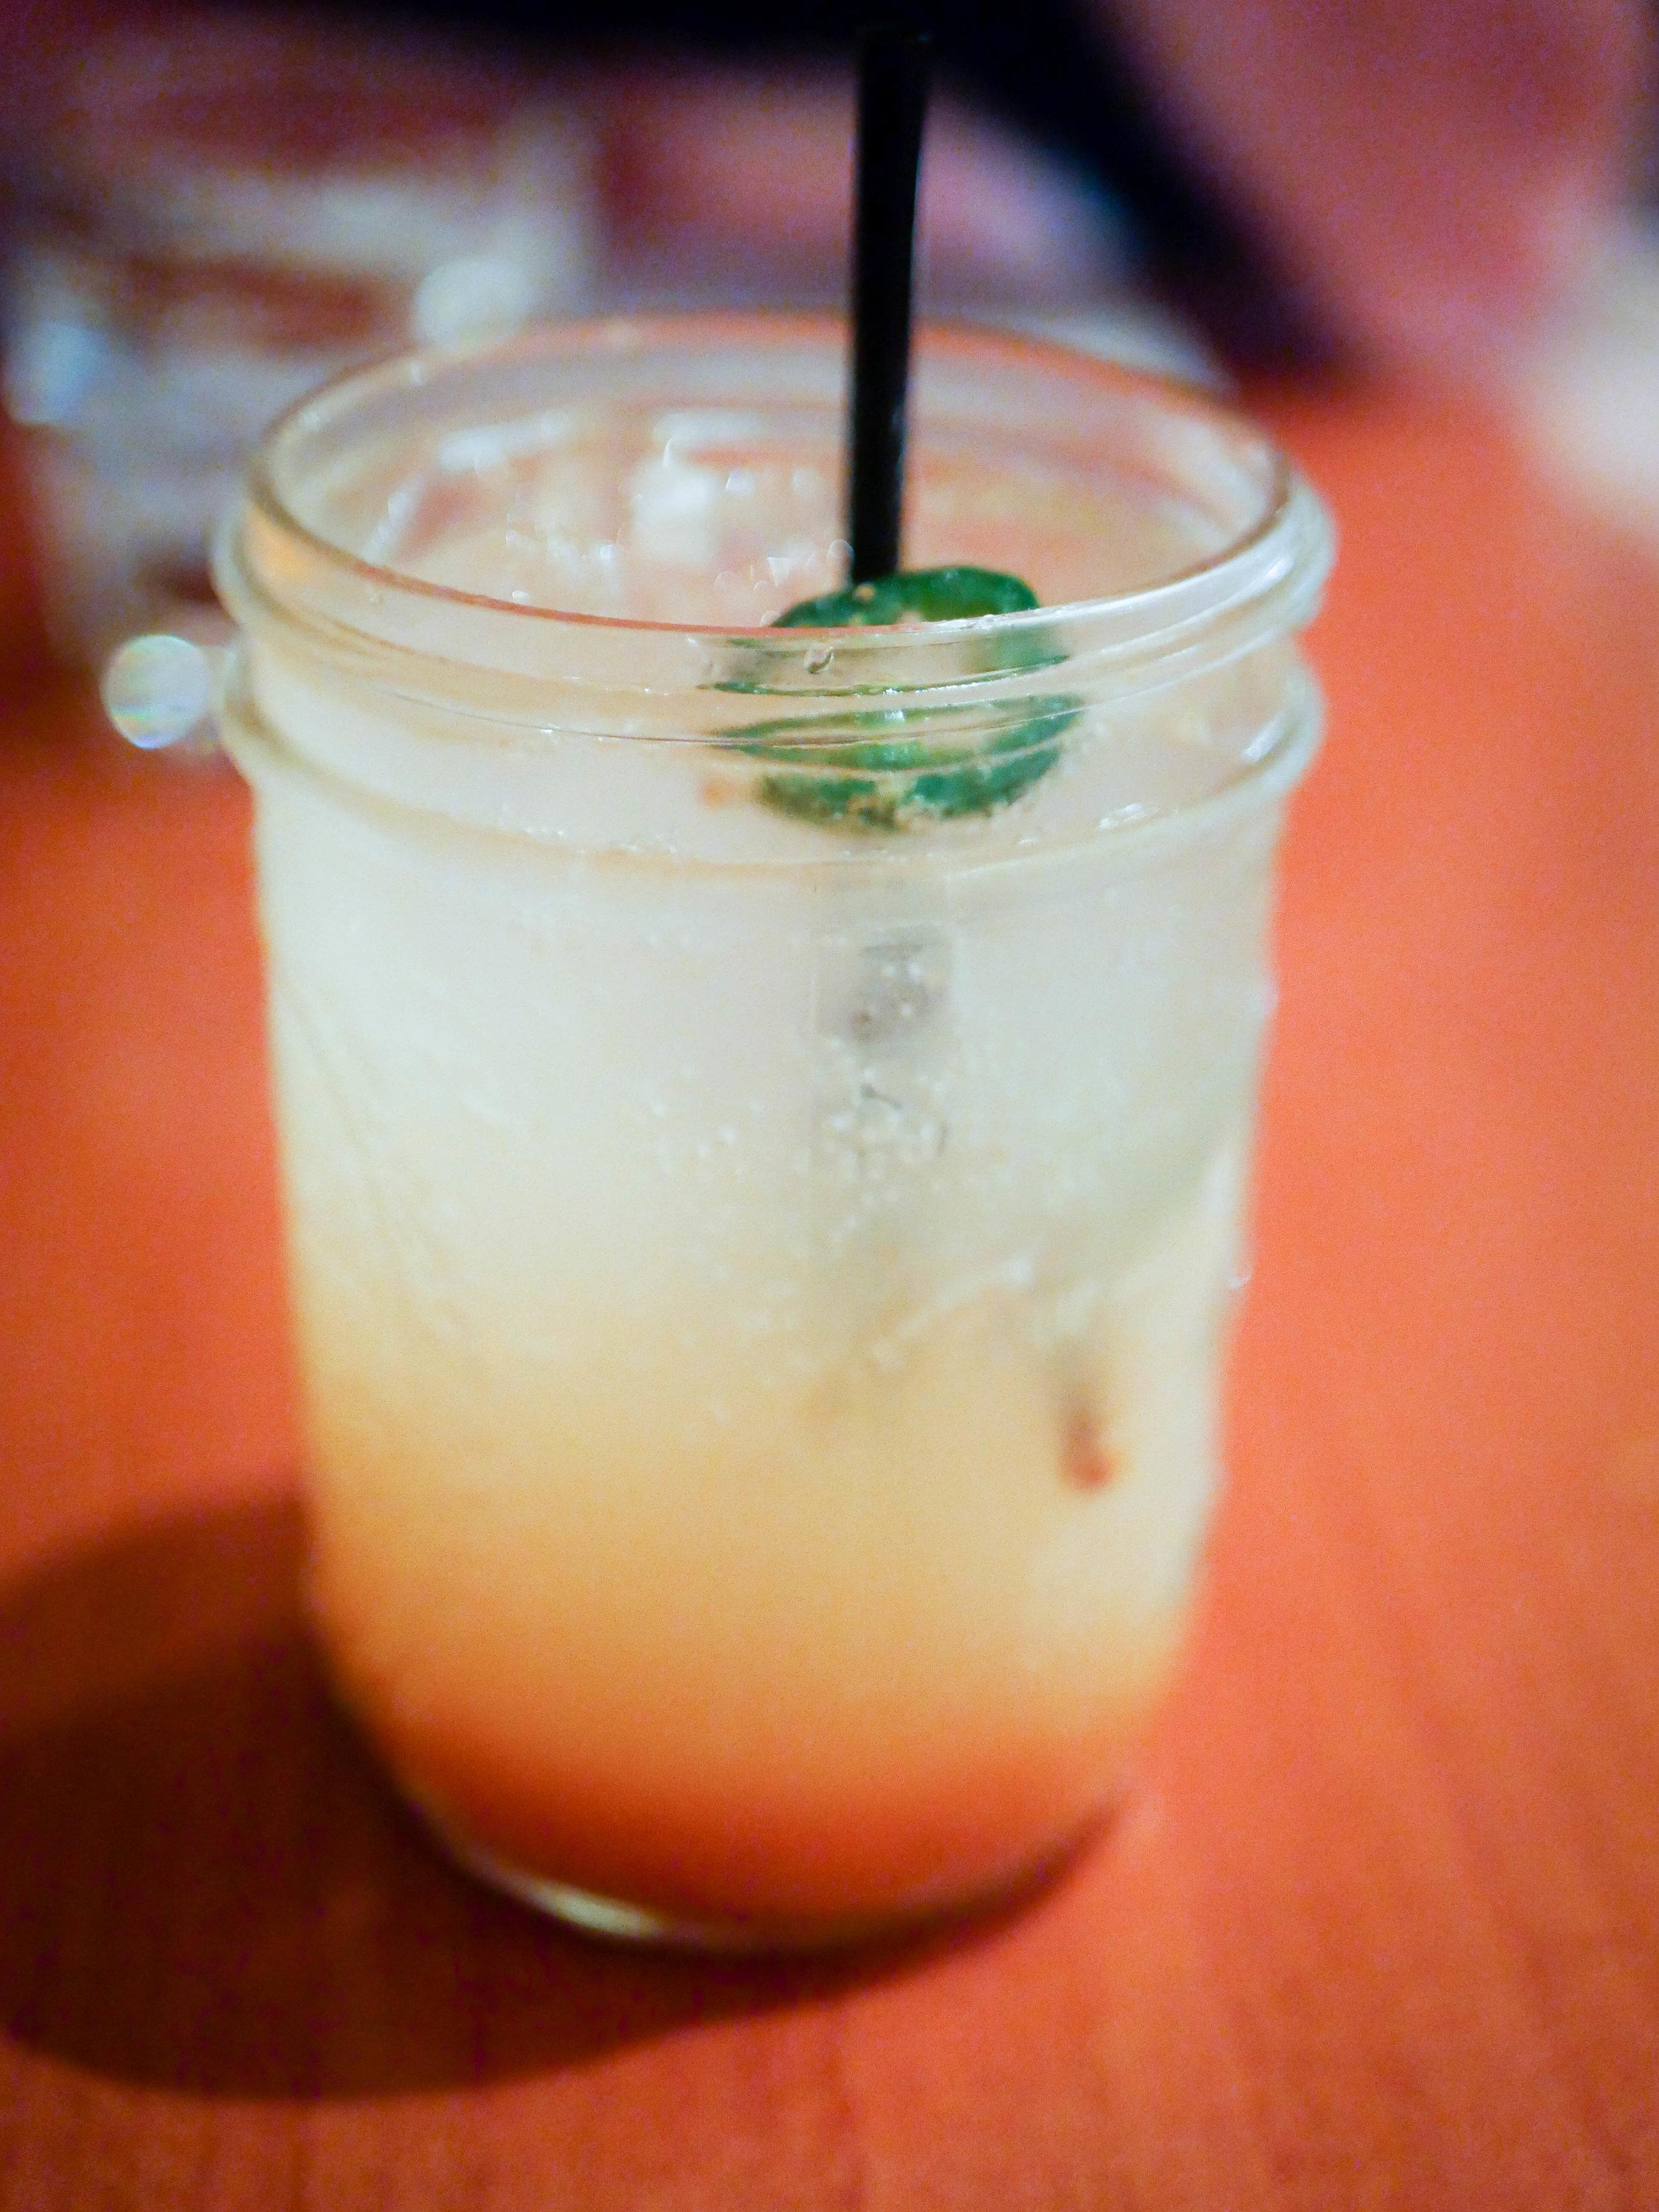 Spiced persimmon jalapeno soda from Luna Red in San Luis Obispo.